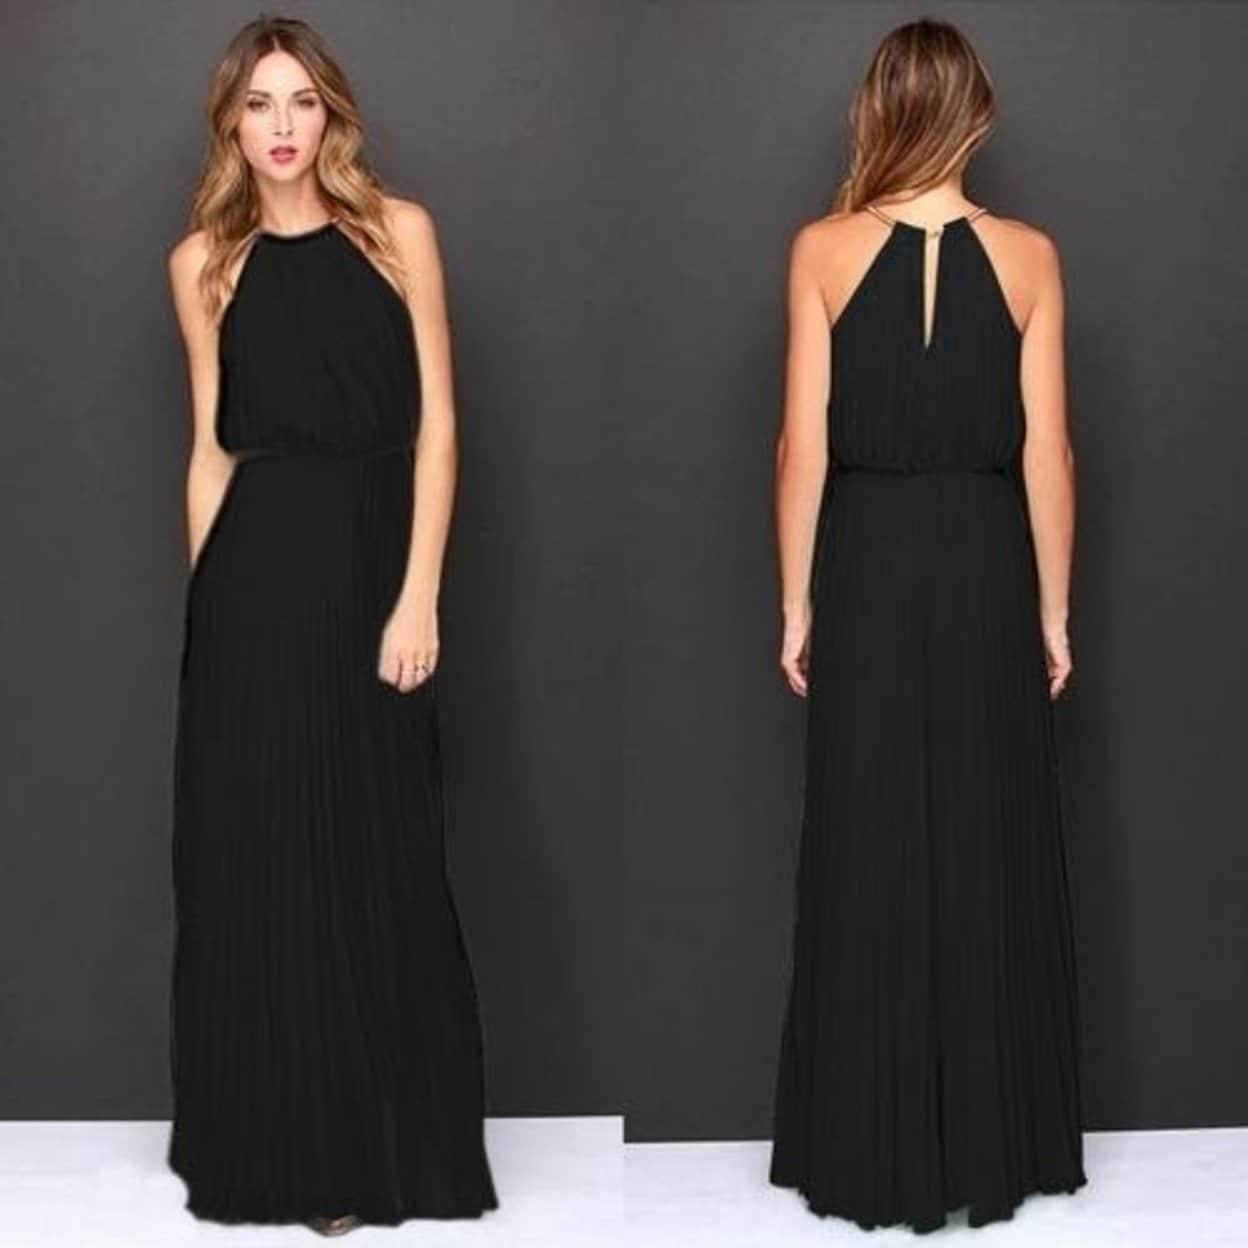 265953bc7b0 Boho Long Maxi Evening Party Dress Beach Dresses